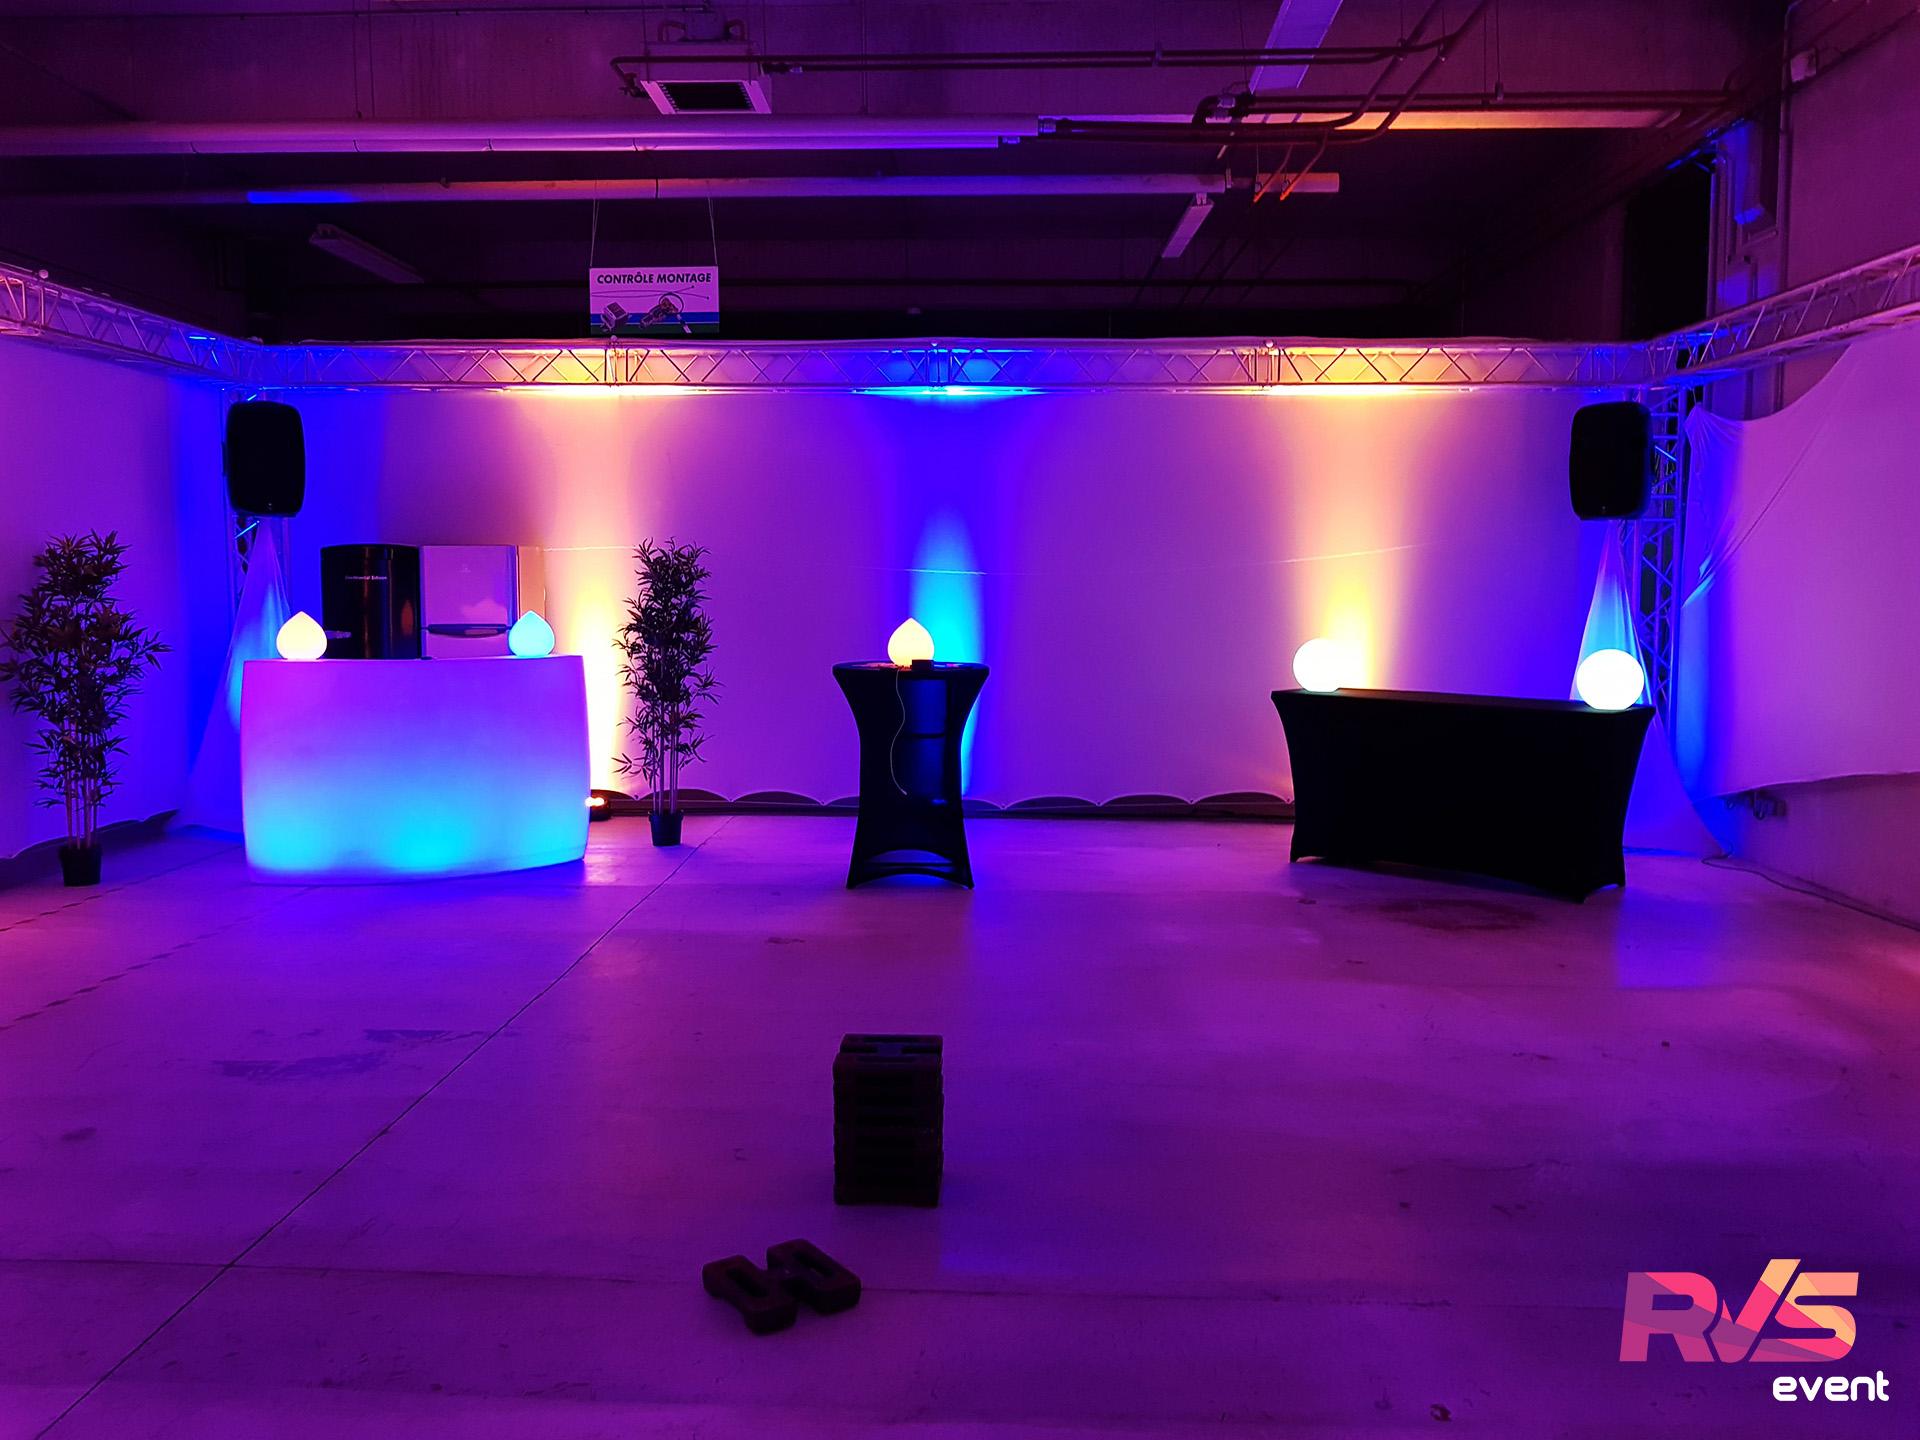 Lumières & sonorisation - RVS Event - 93